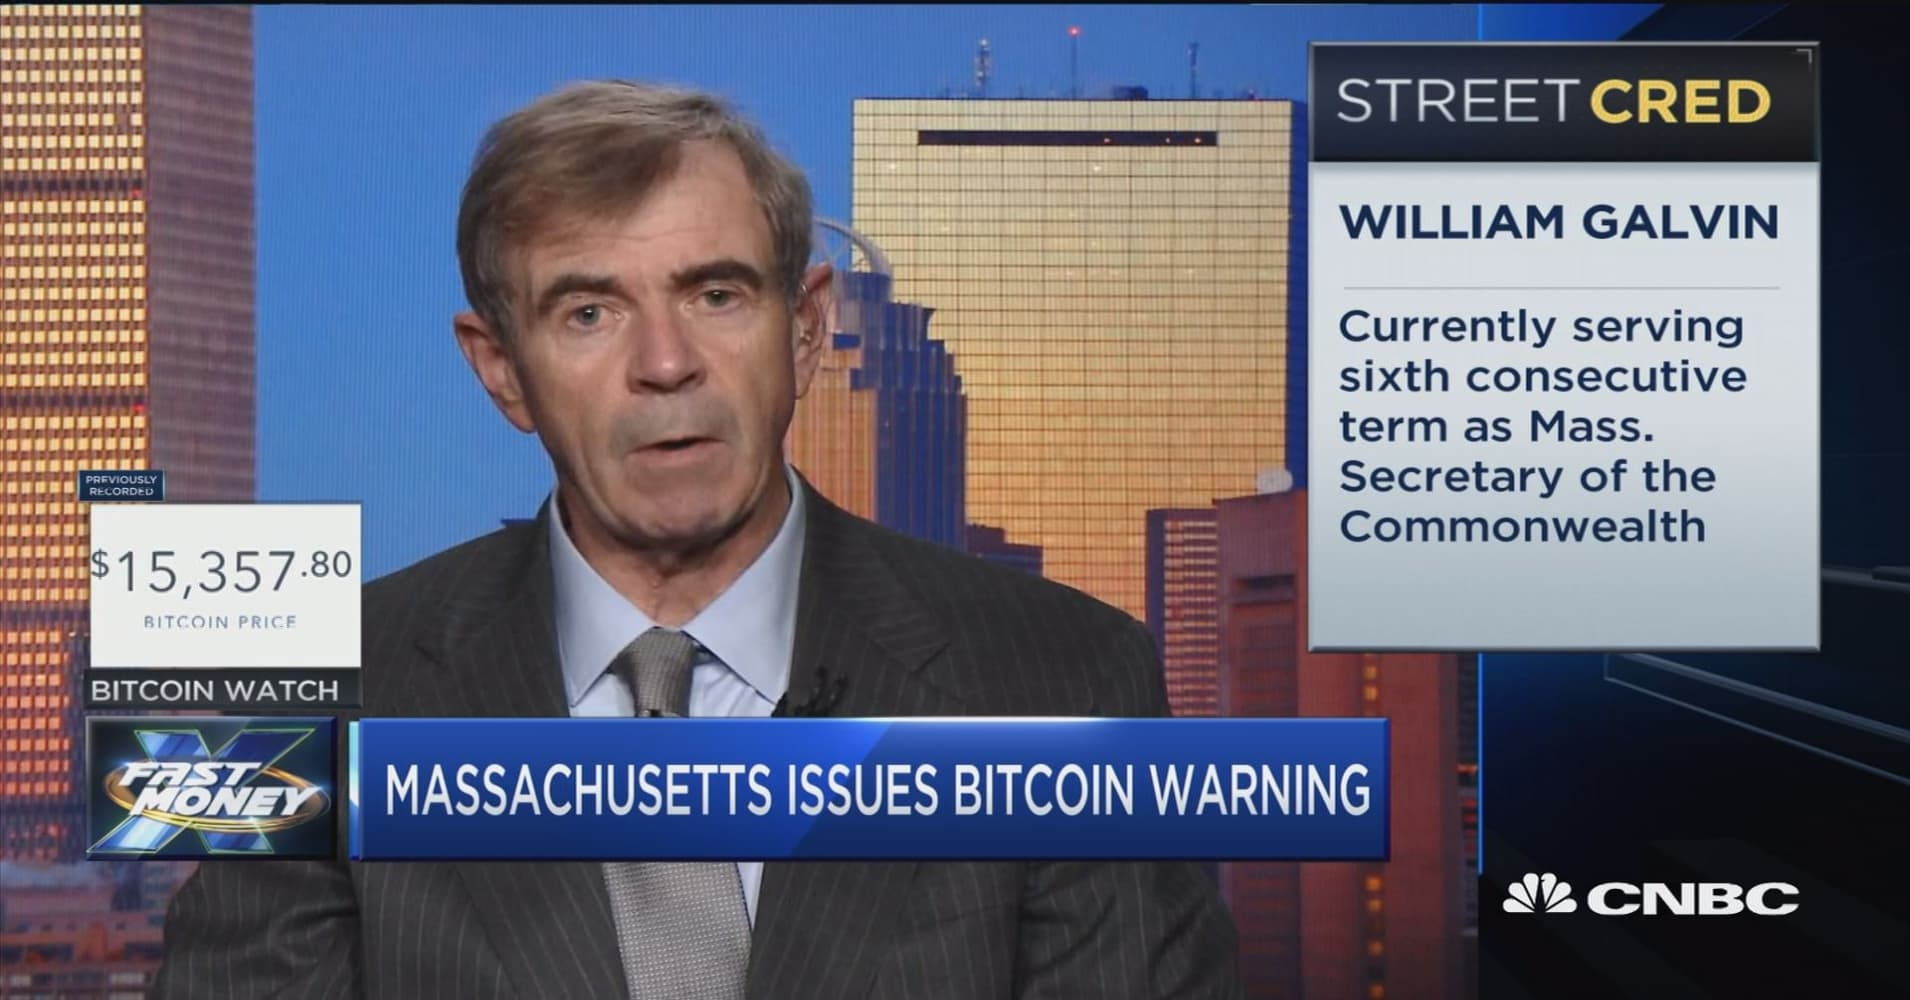 Massachusetts' Secretary of Commonwealth speaks out on the dangers of bitcoin